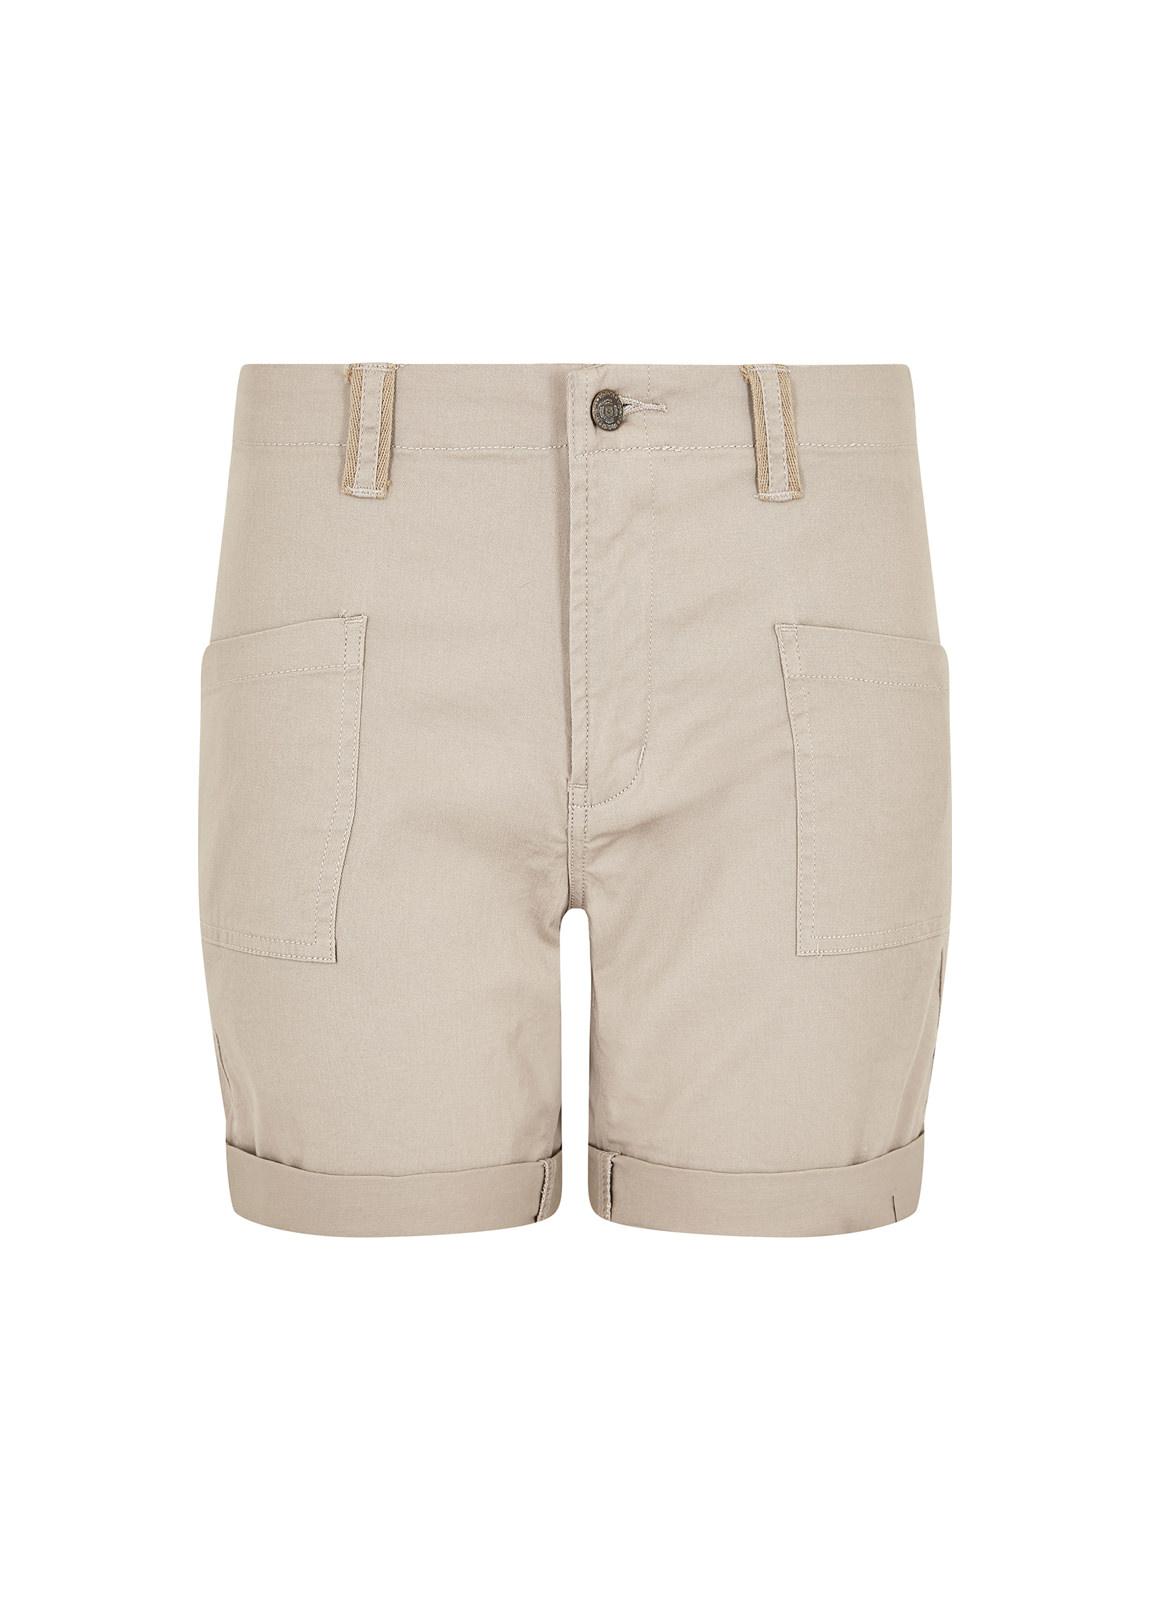 Bellinter Shorts - Tan